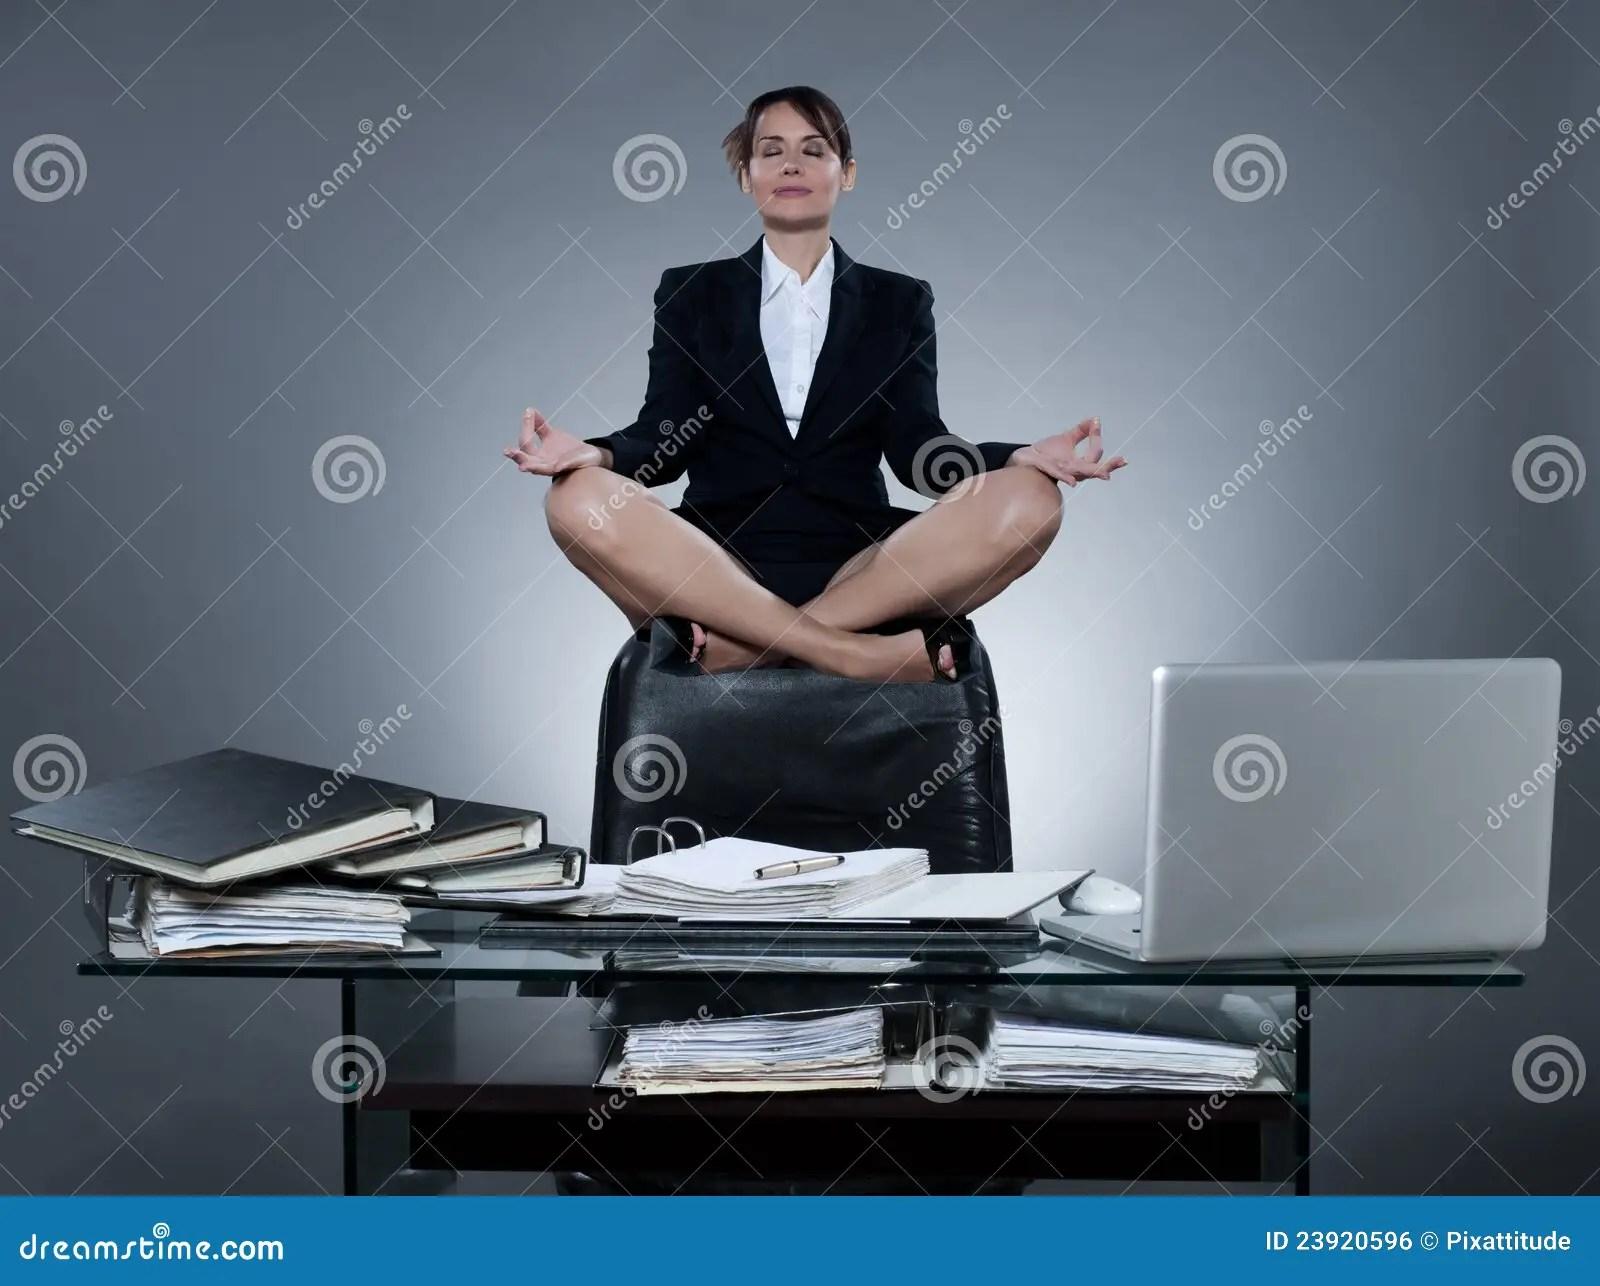 Business Secretary Woman Levitation Stock Photo  Image